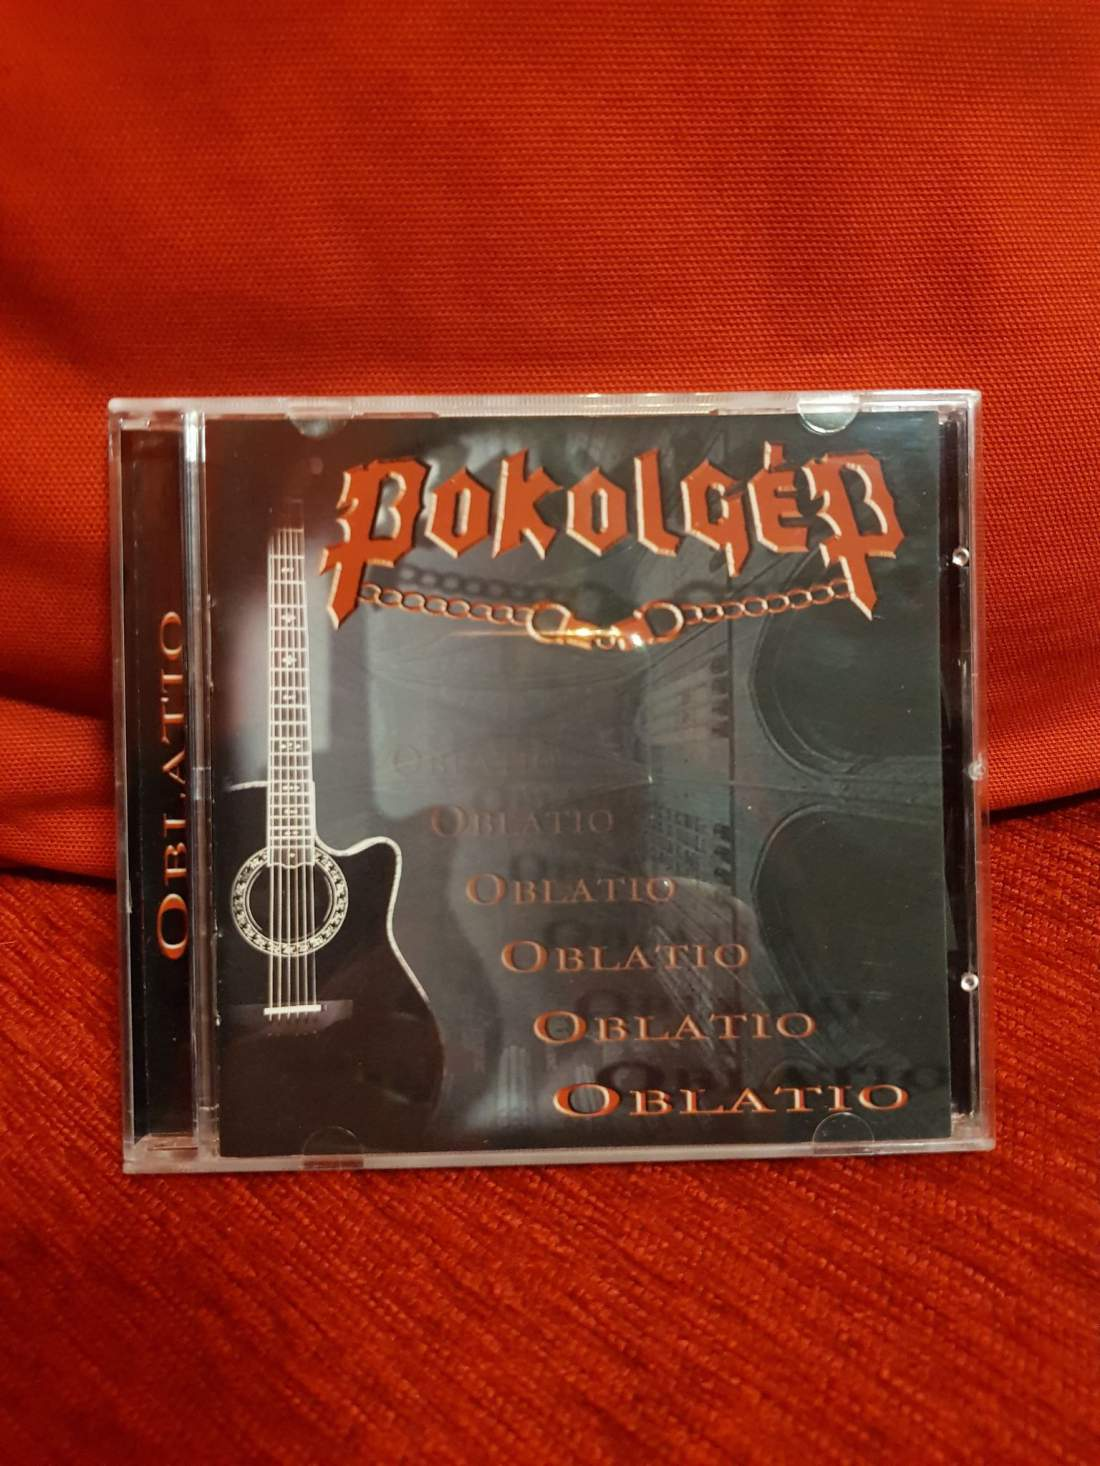 POKOLGÉP - OBLATIO CD